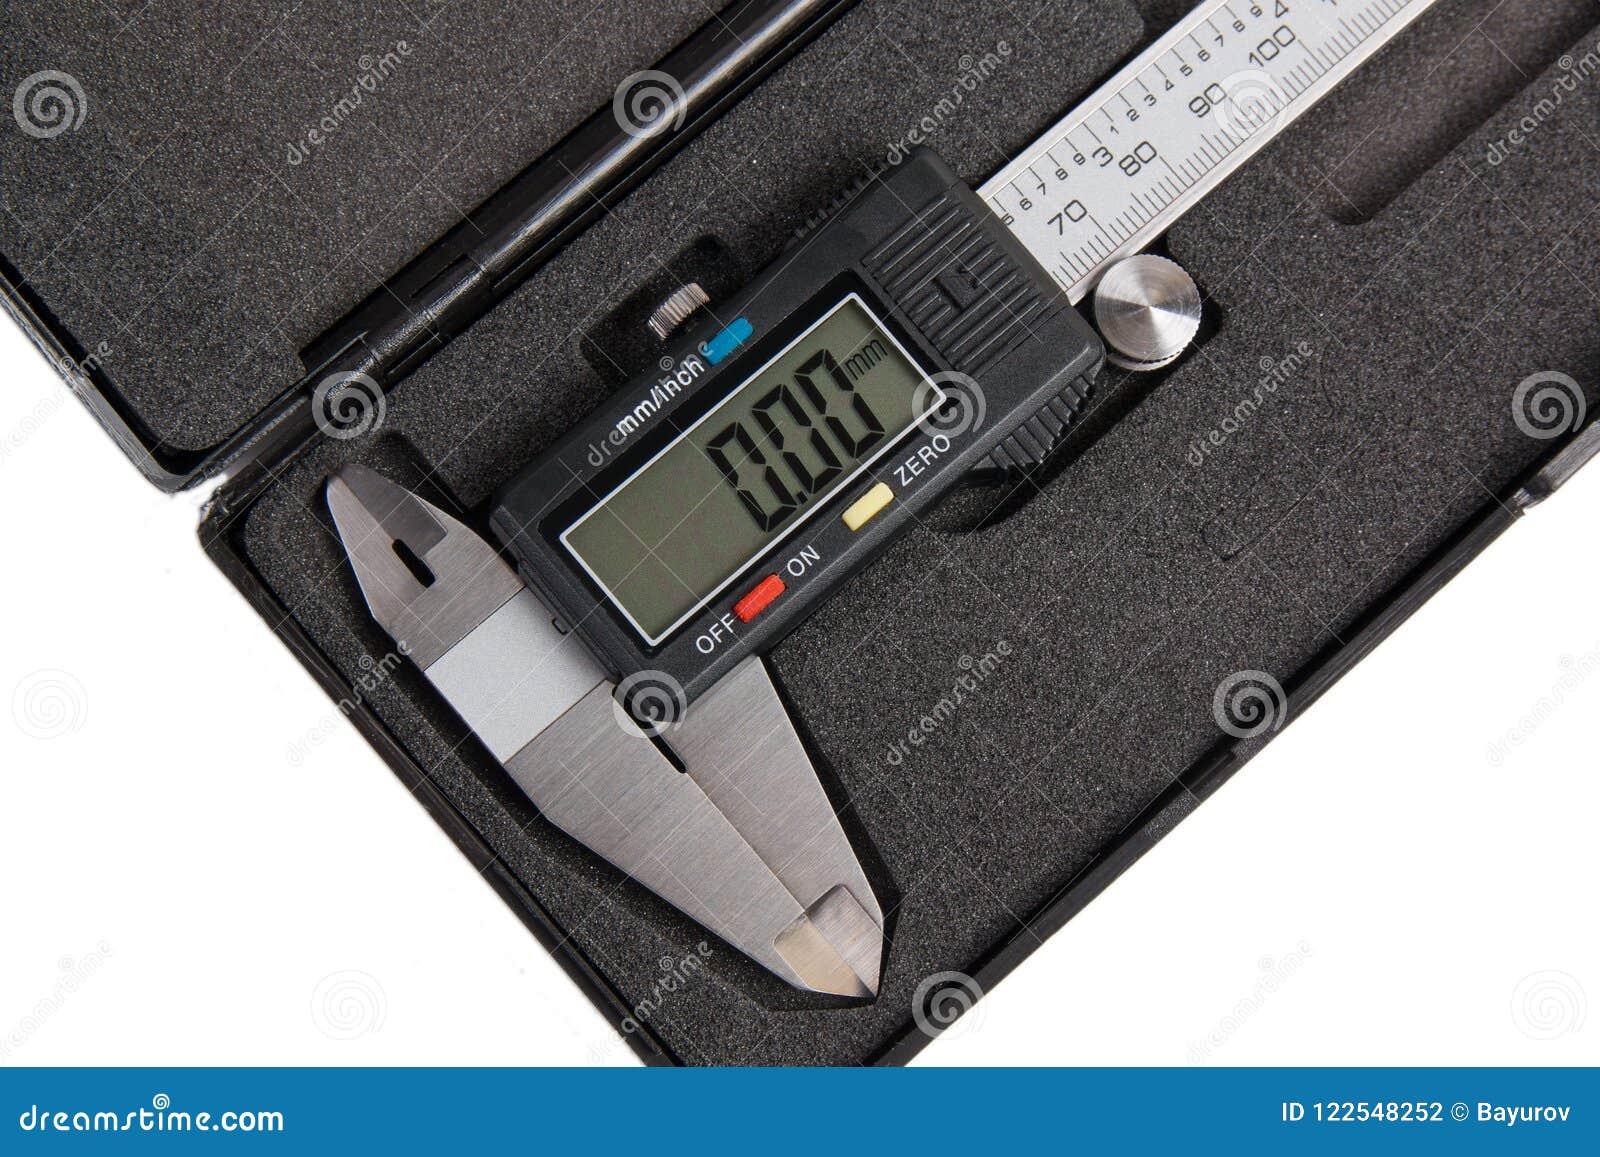 Electronic digital caliper in box